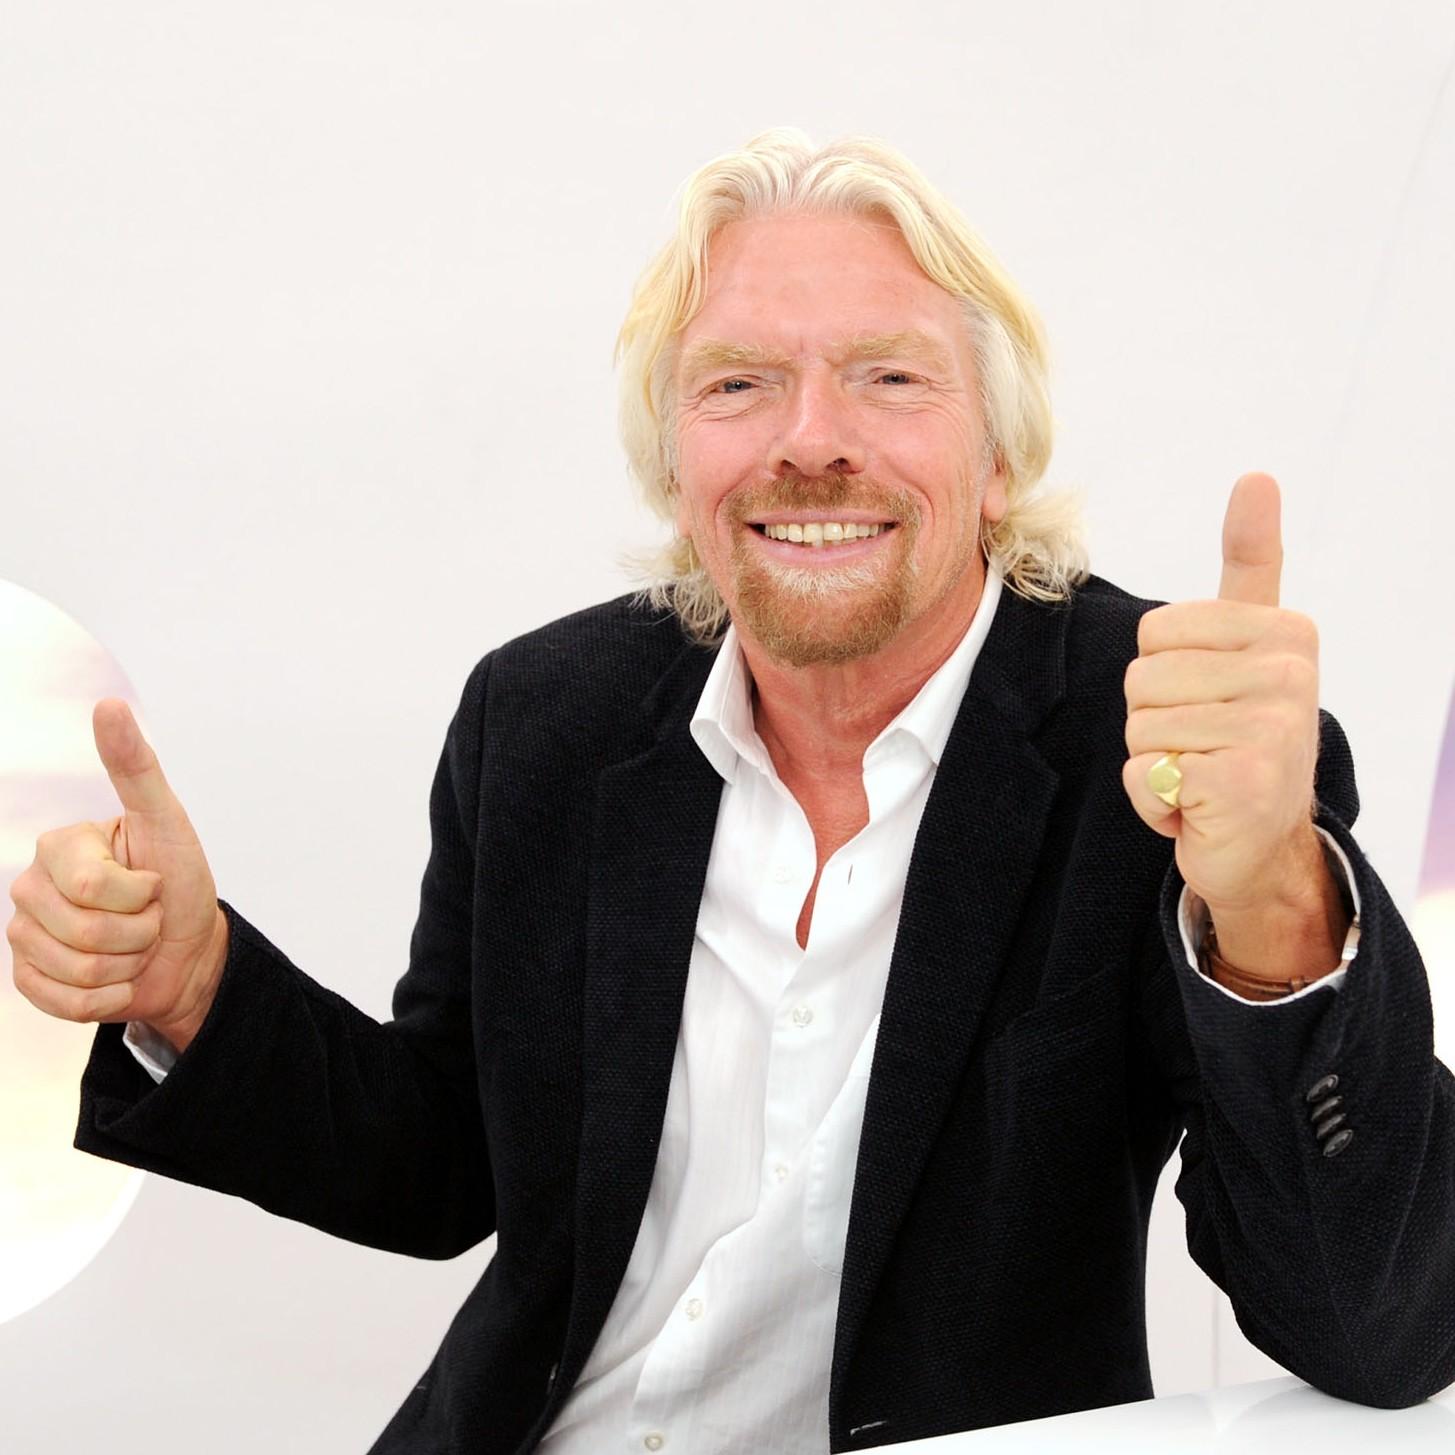 Sir Richard Branson: Richard Branson Teams With Venrock, Shasta For $21m